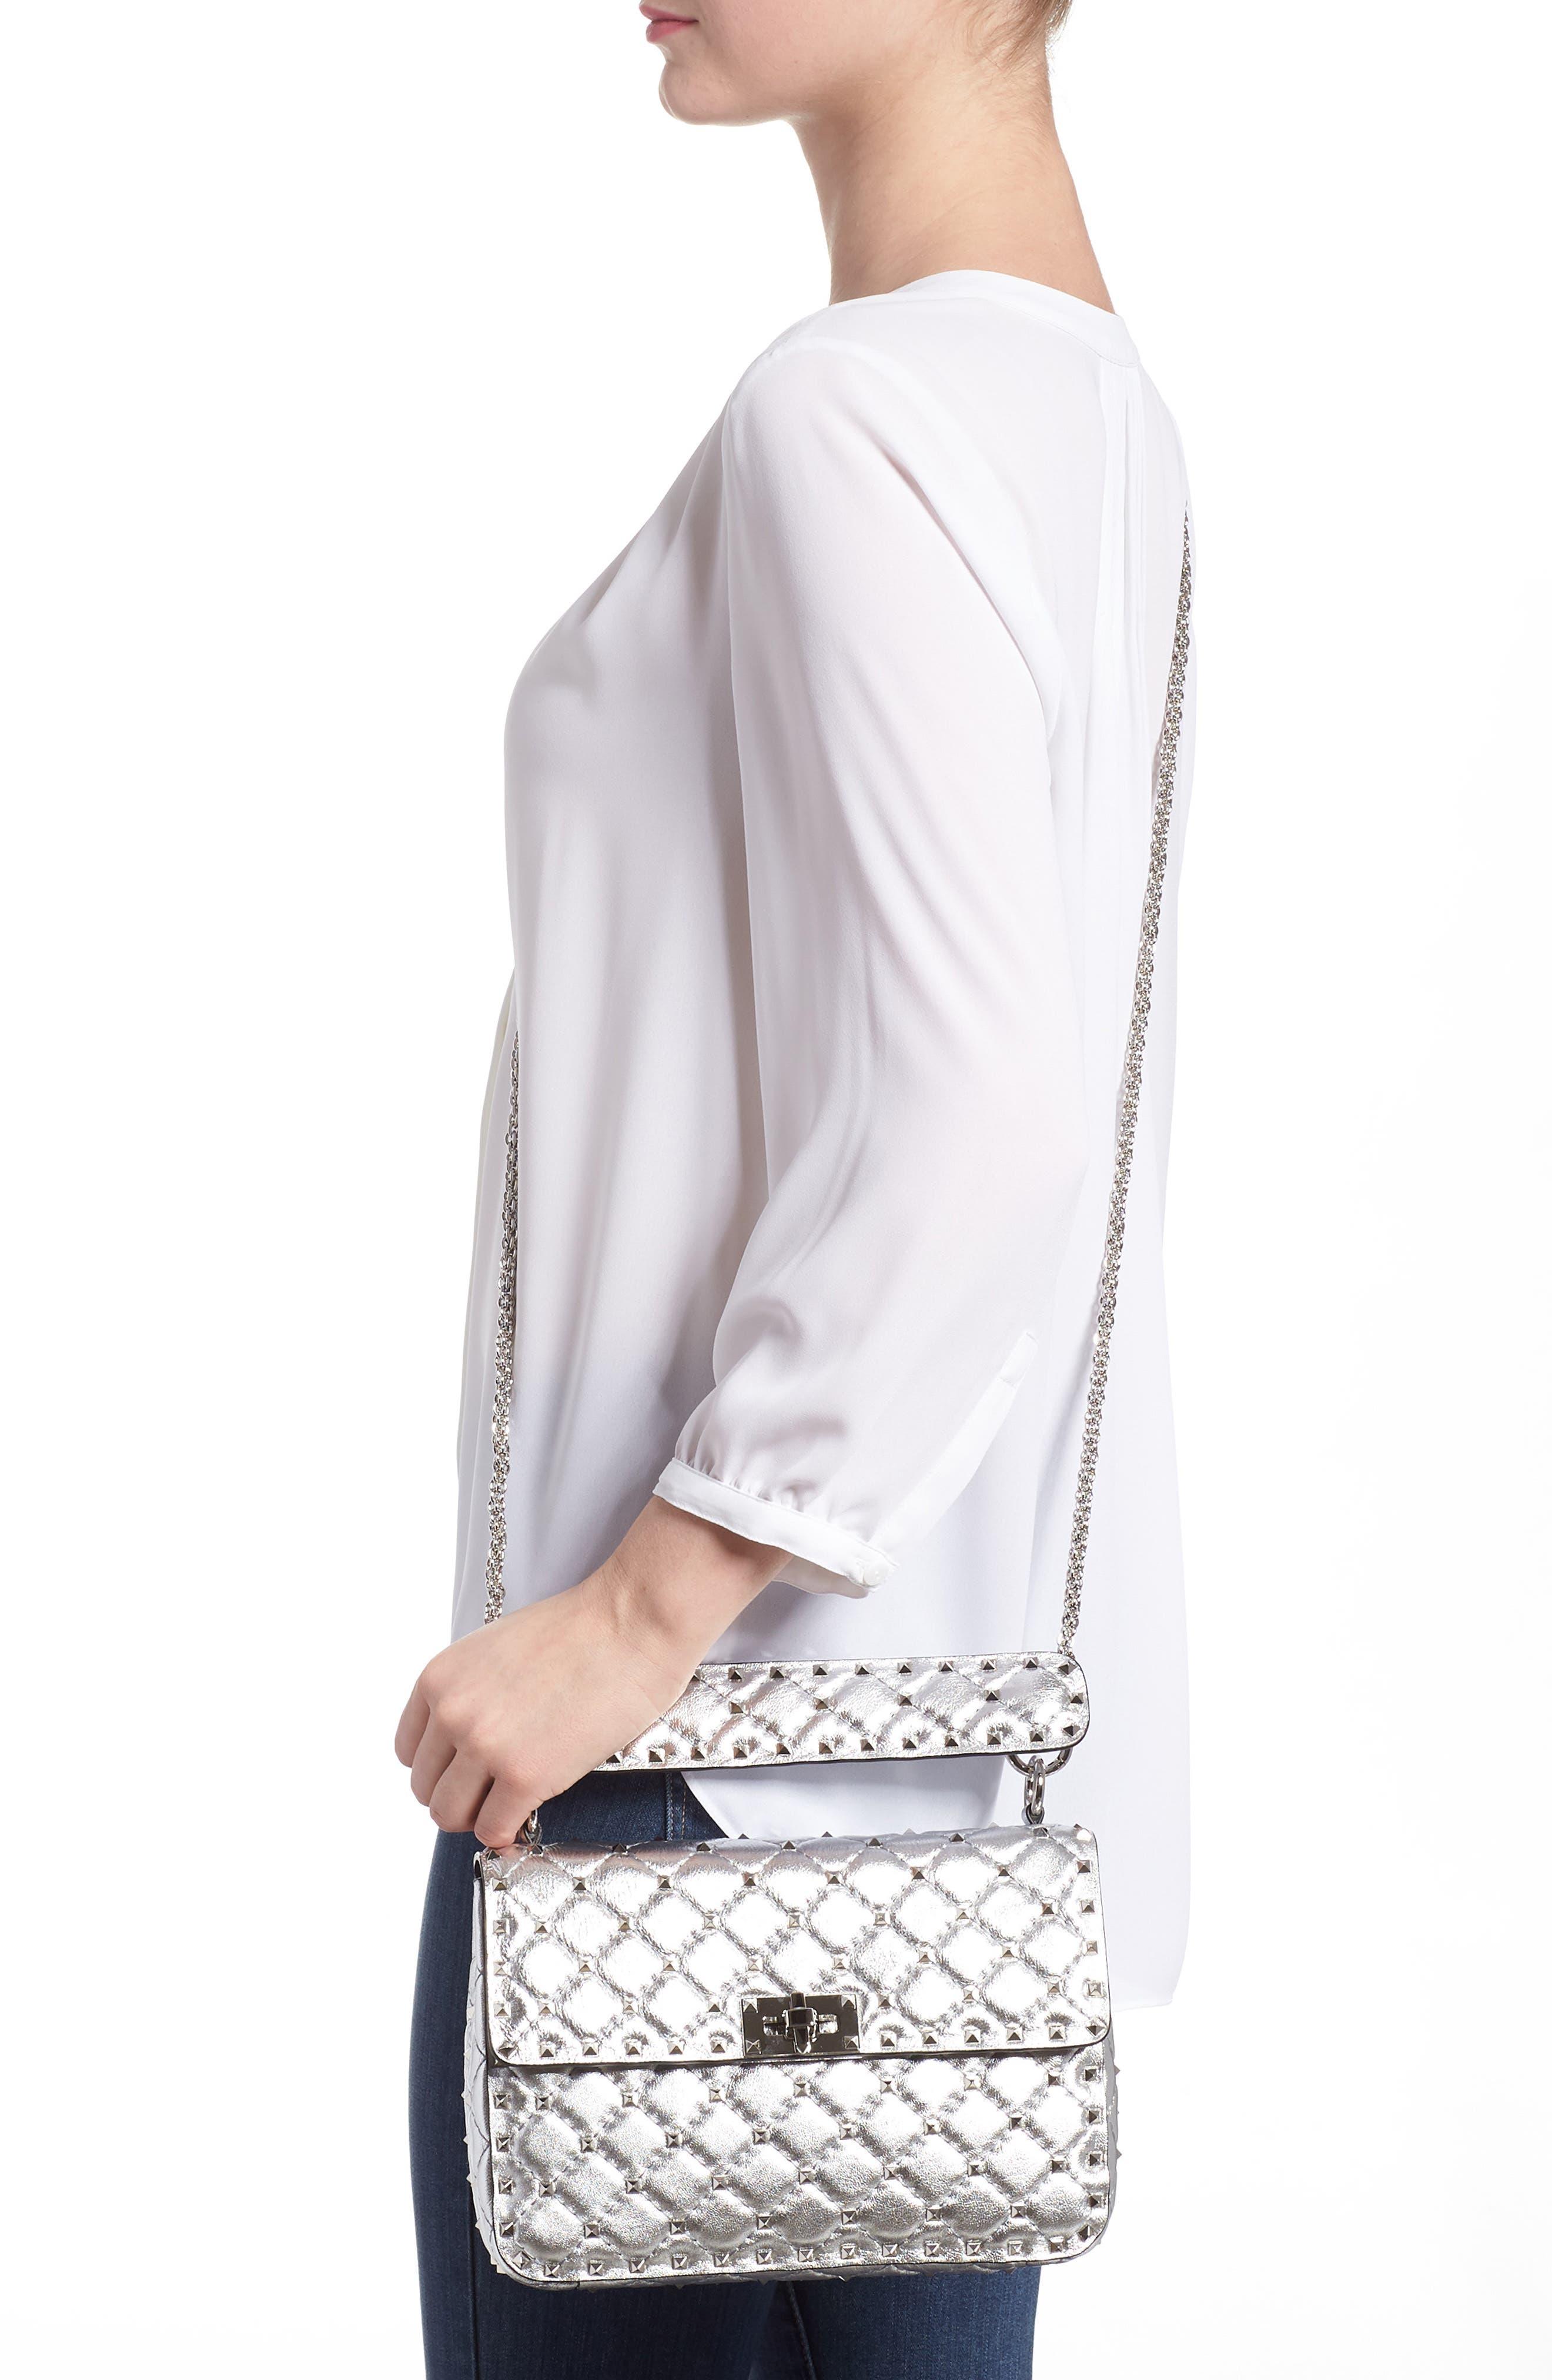 Medium Rockstud Spike Metallic Leather Shoulder Bag,                             Alternate thumbnail 2, color,                             Silver